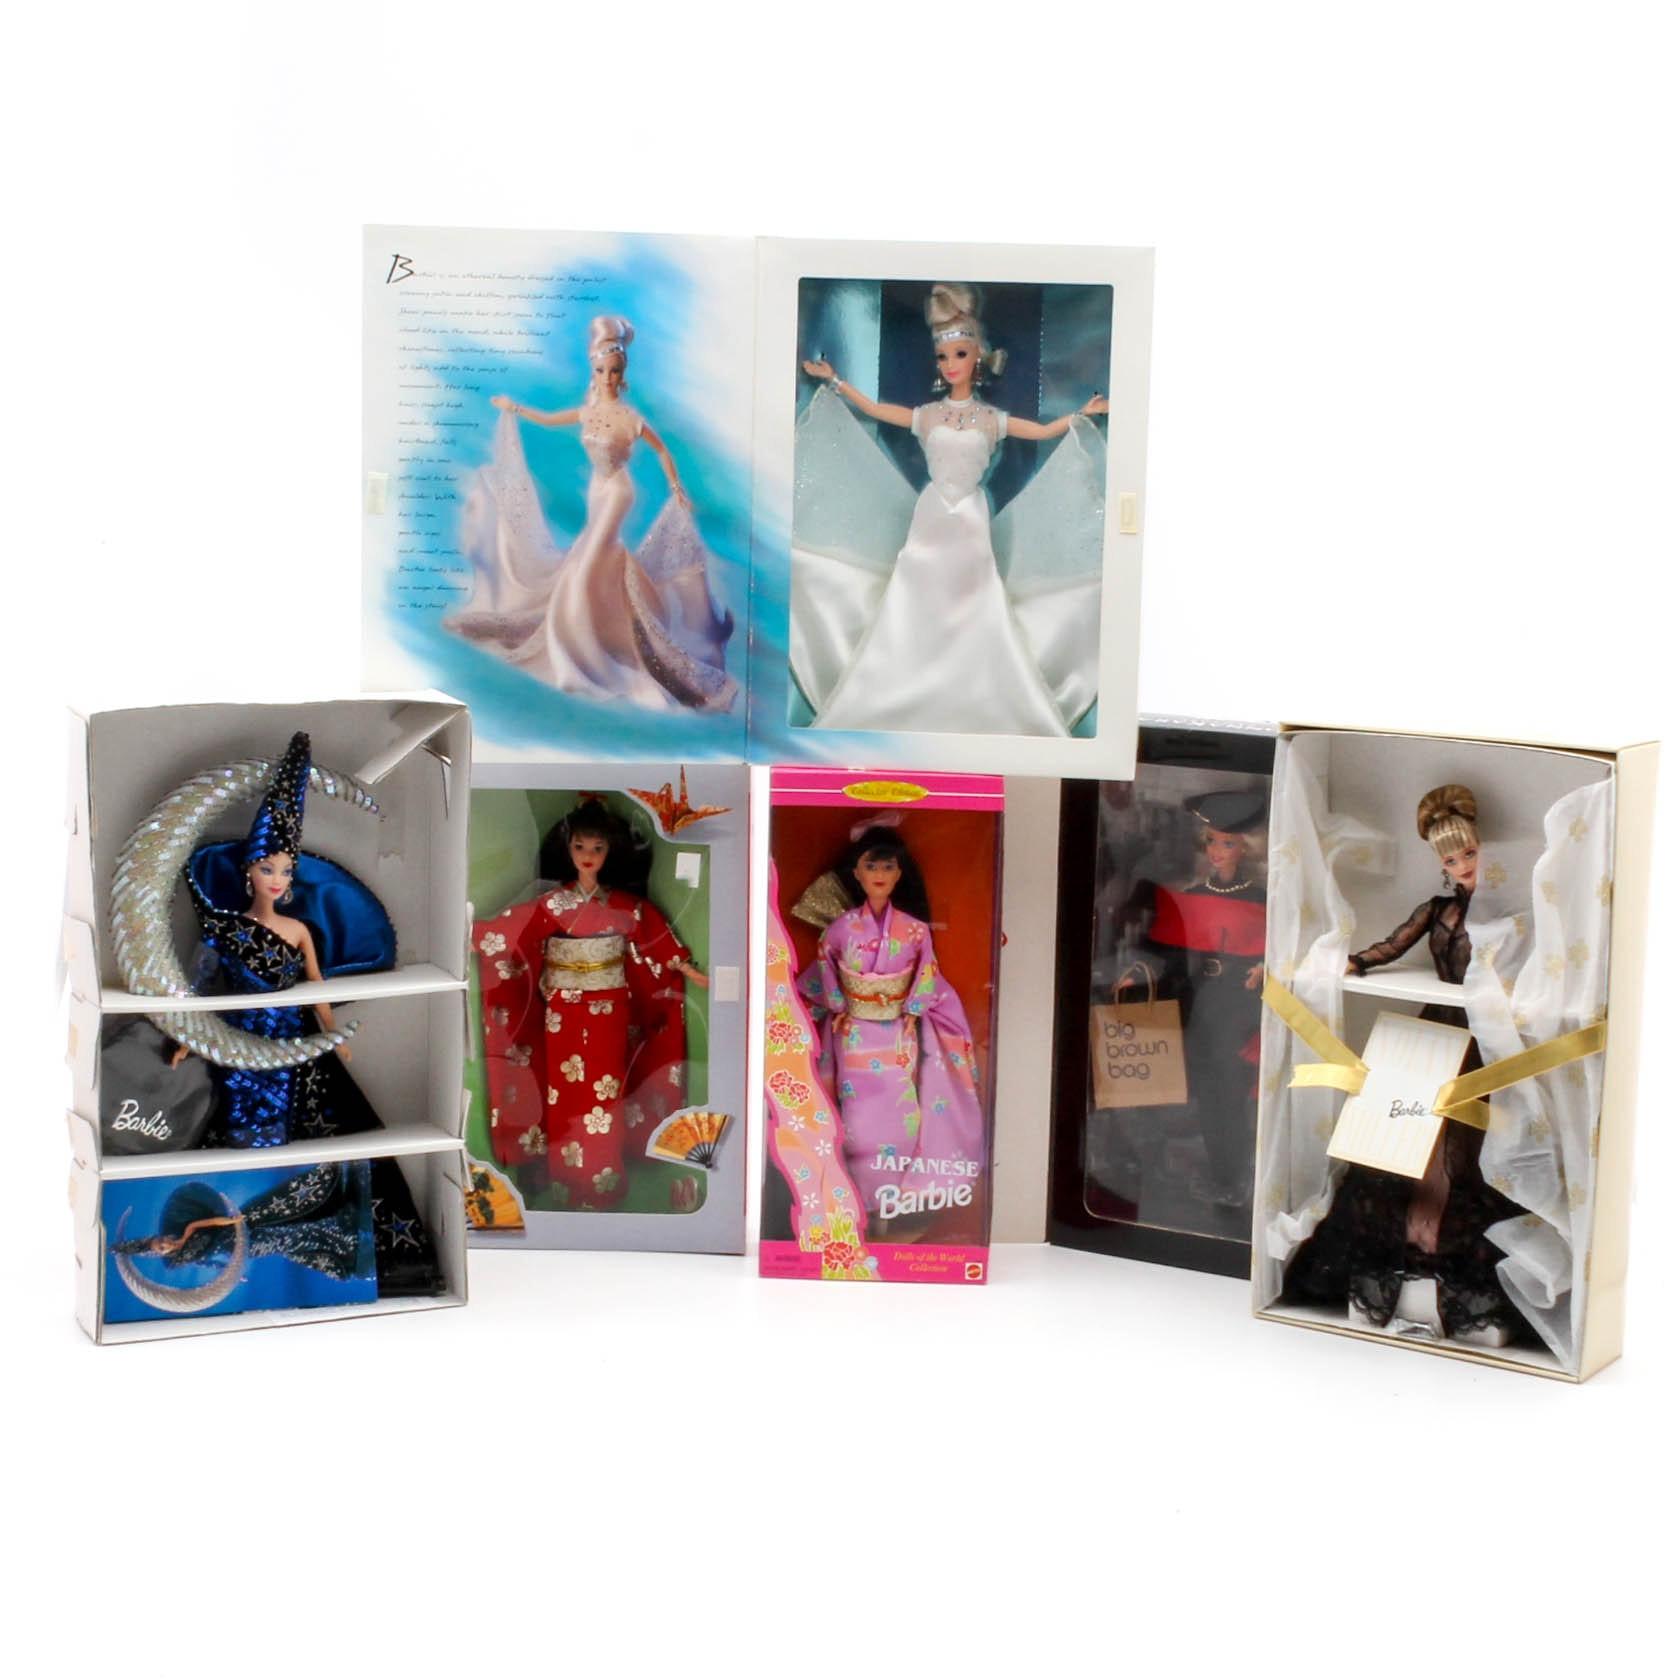 Designer Mattel Barbies Featuring Mackie, Miller and Karan